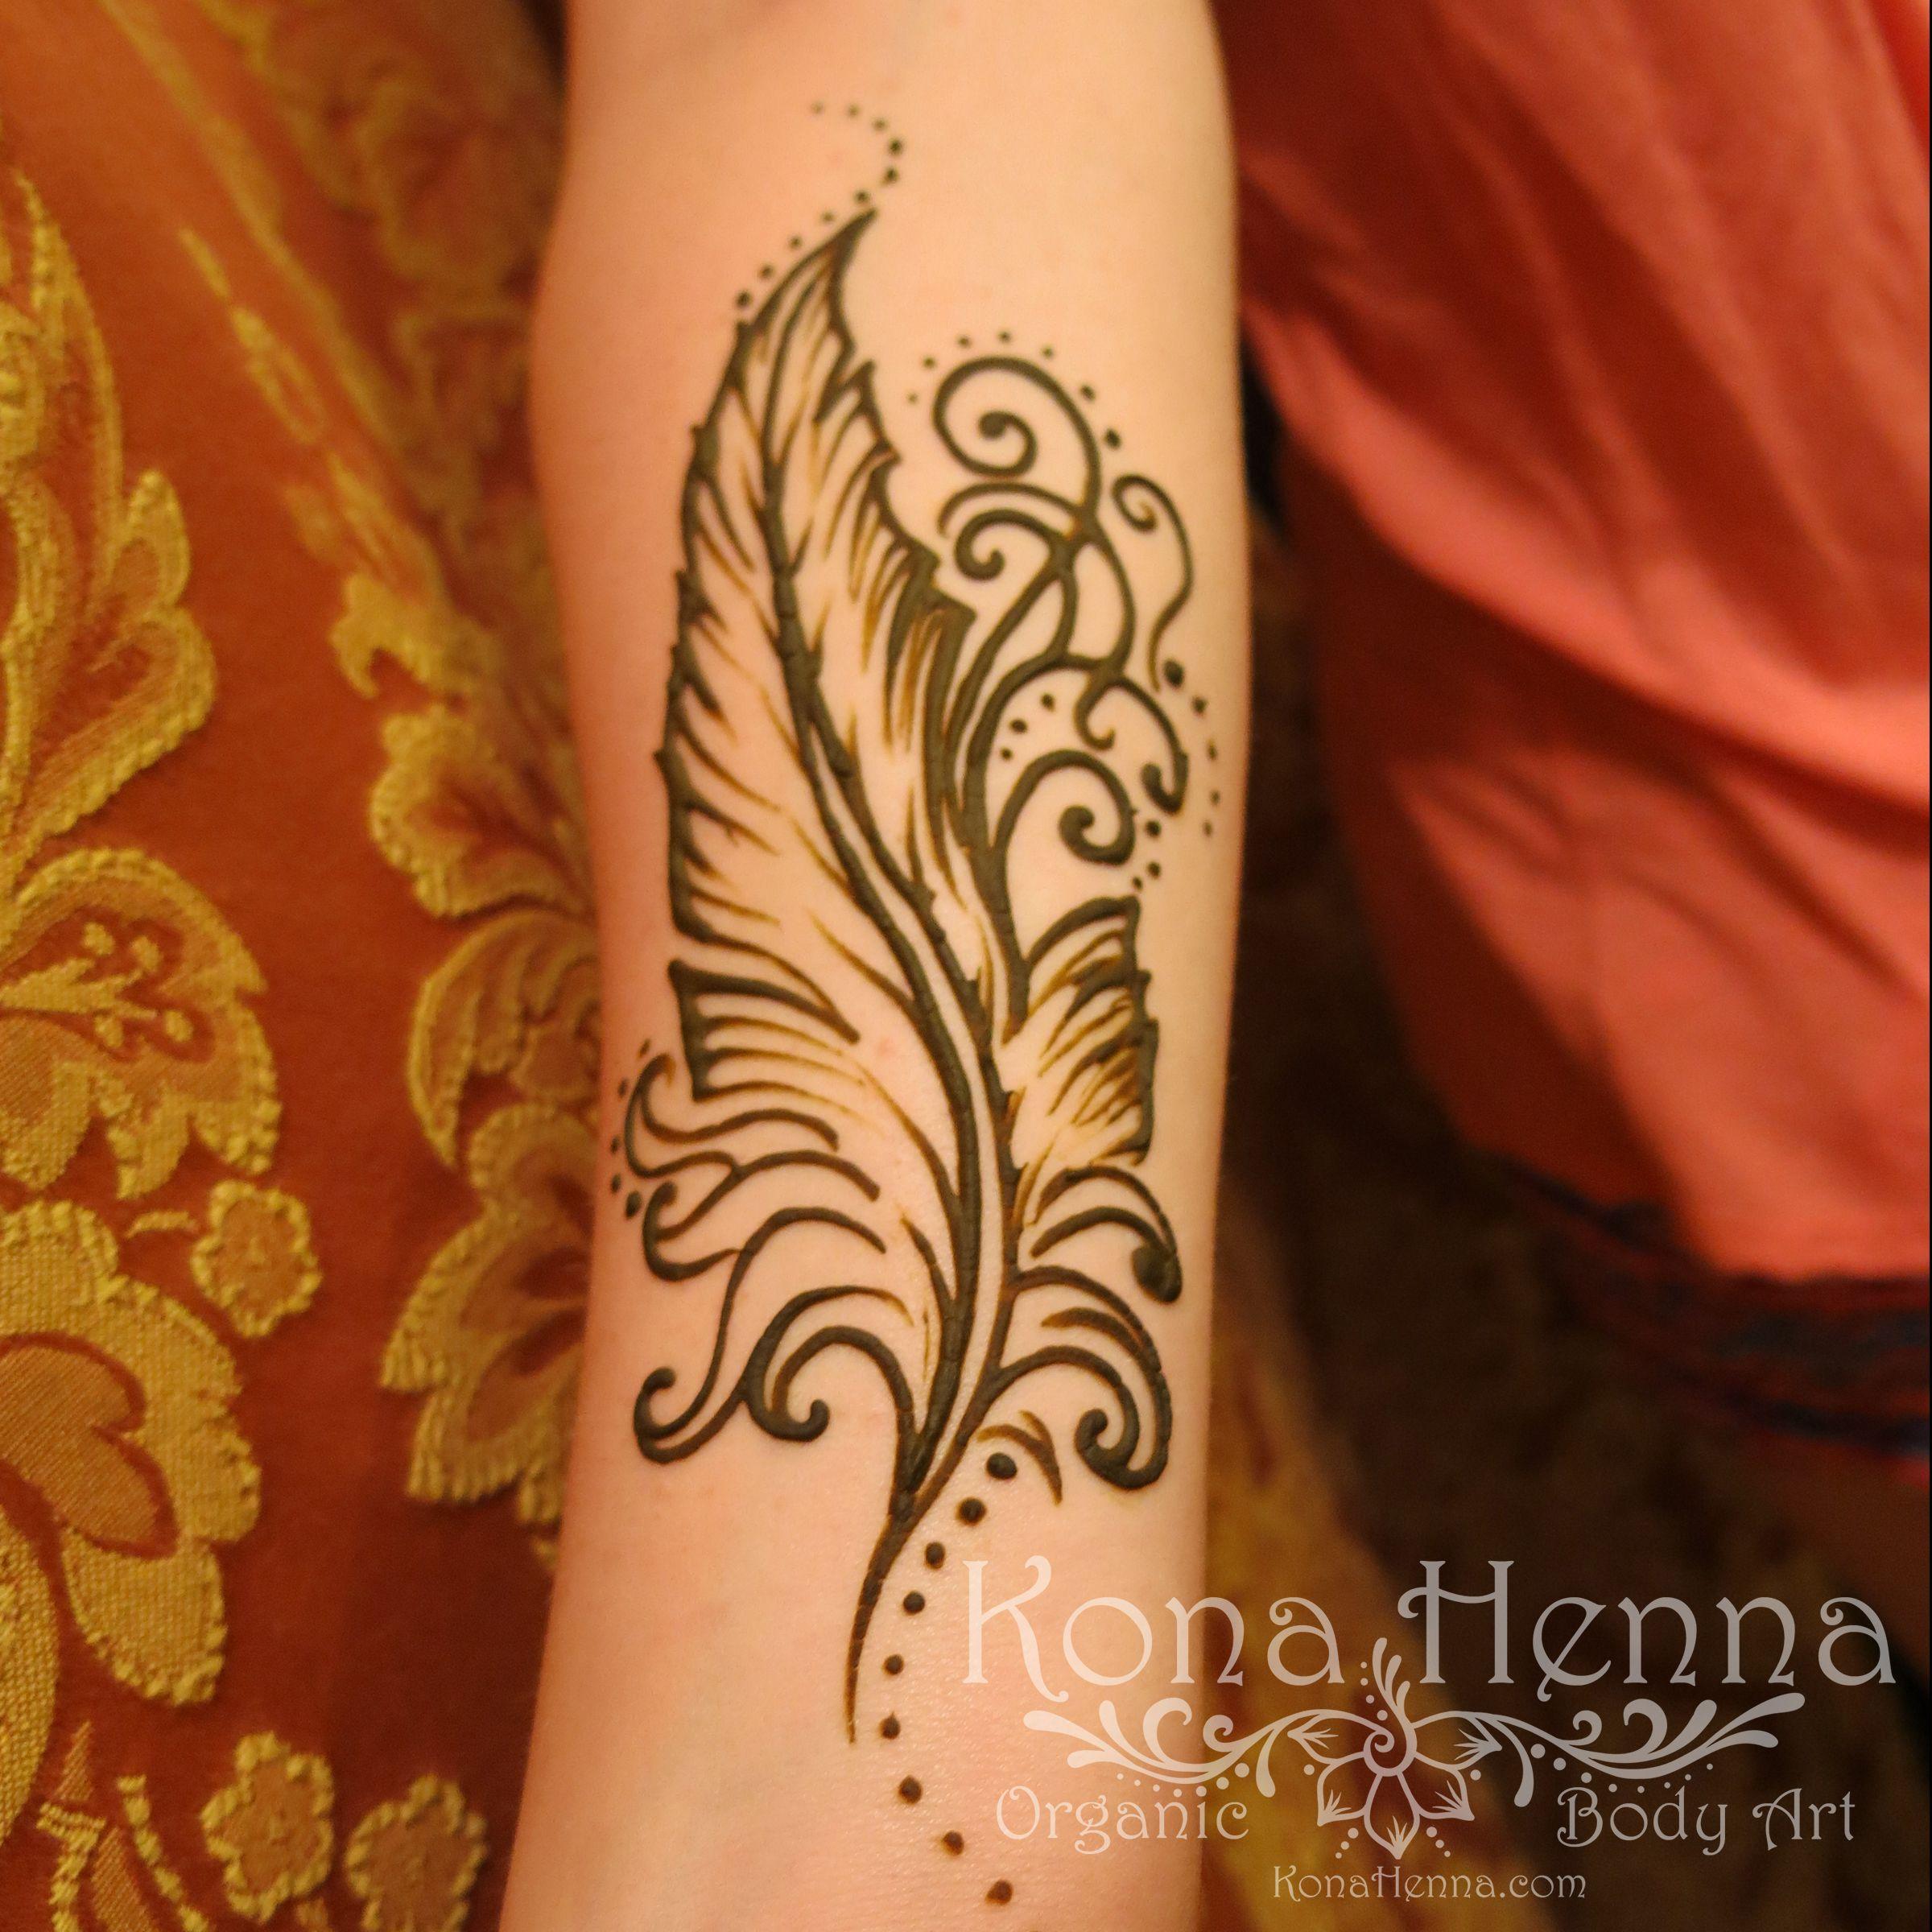 Lower Arm Henna Tattoo: Organic Henna Products. Professional Henna Studio